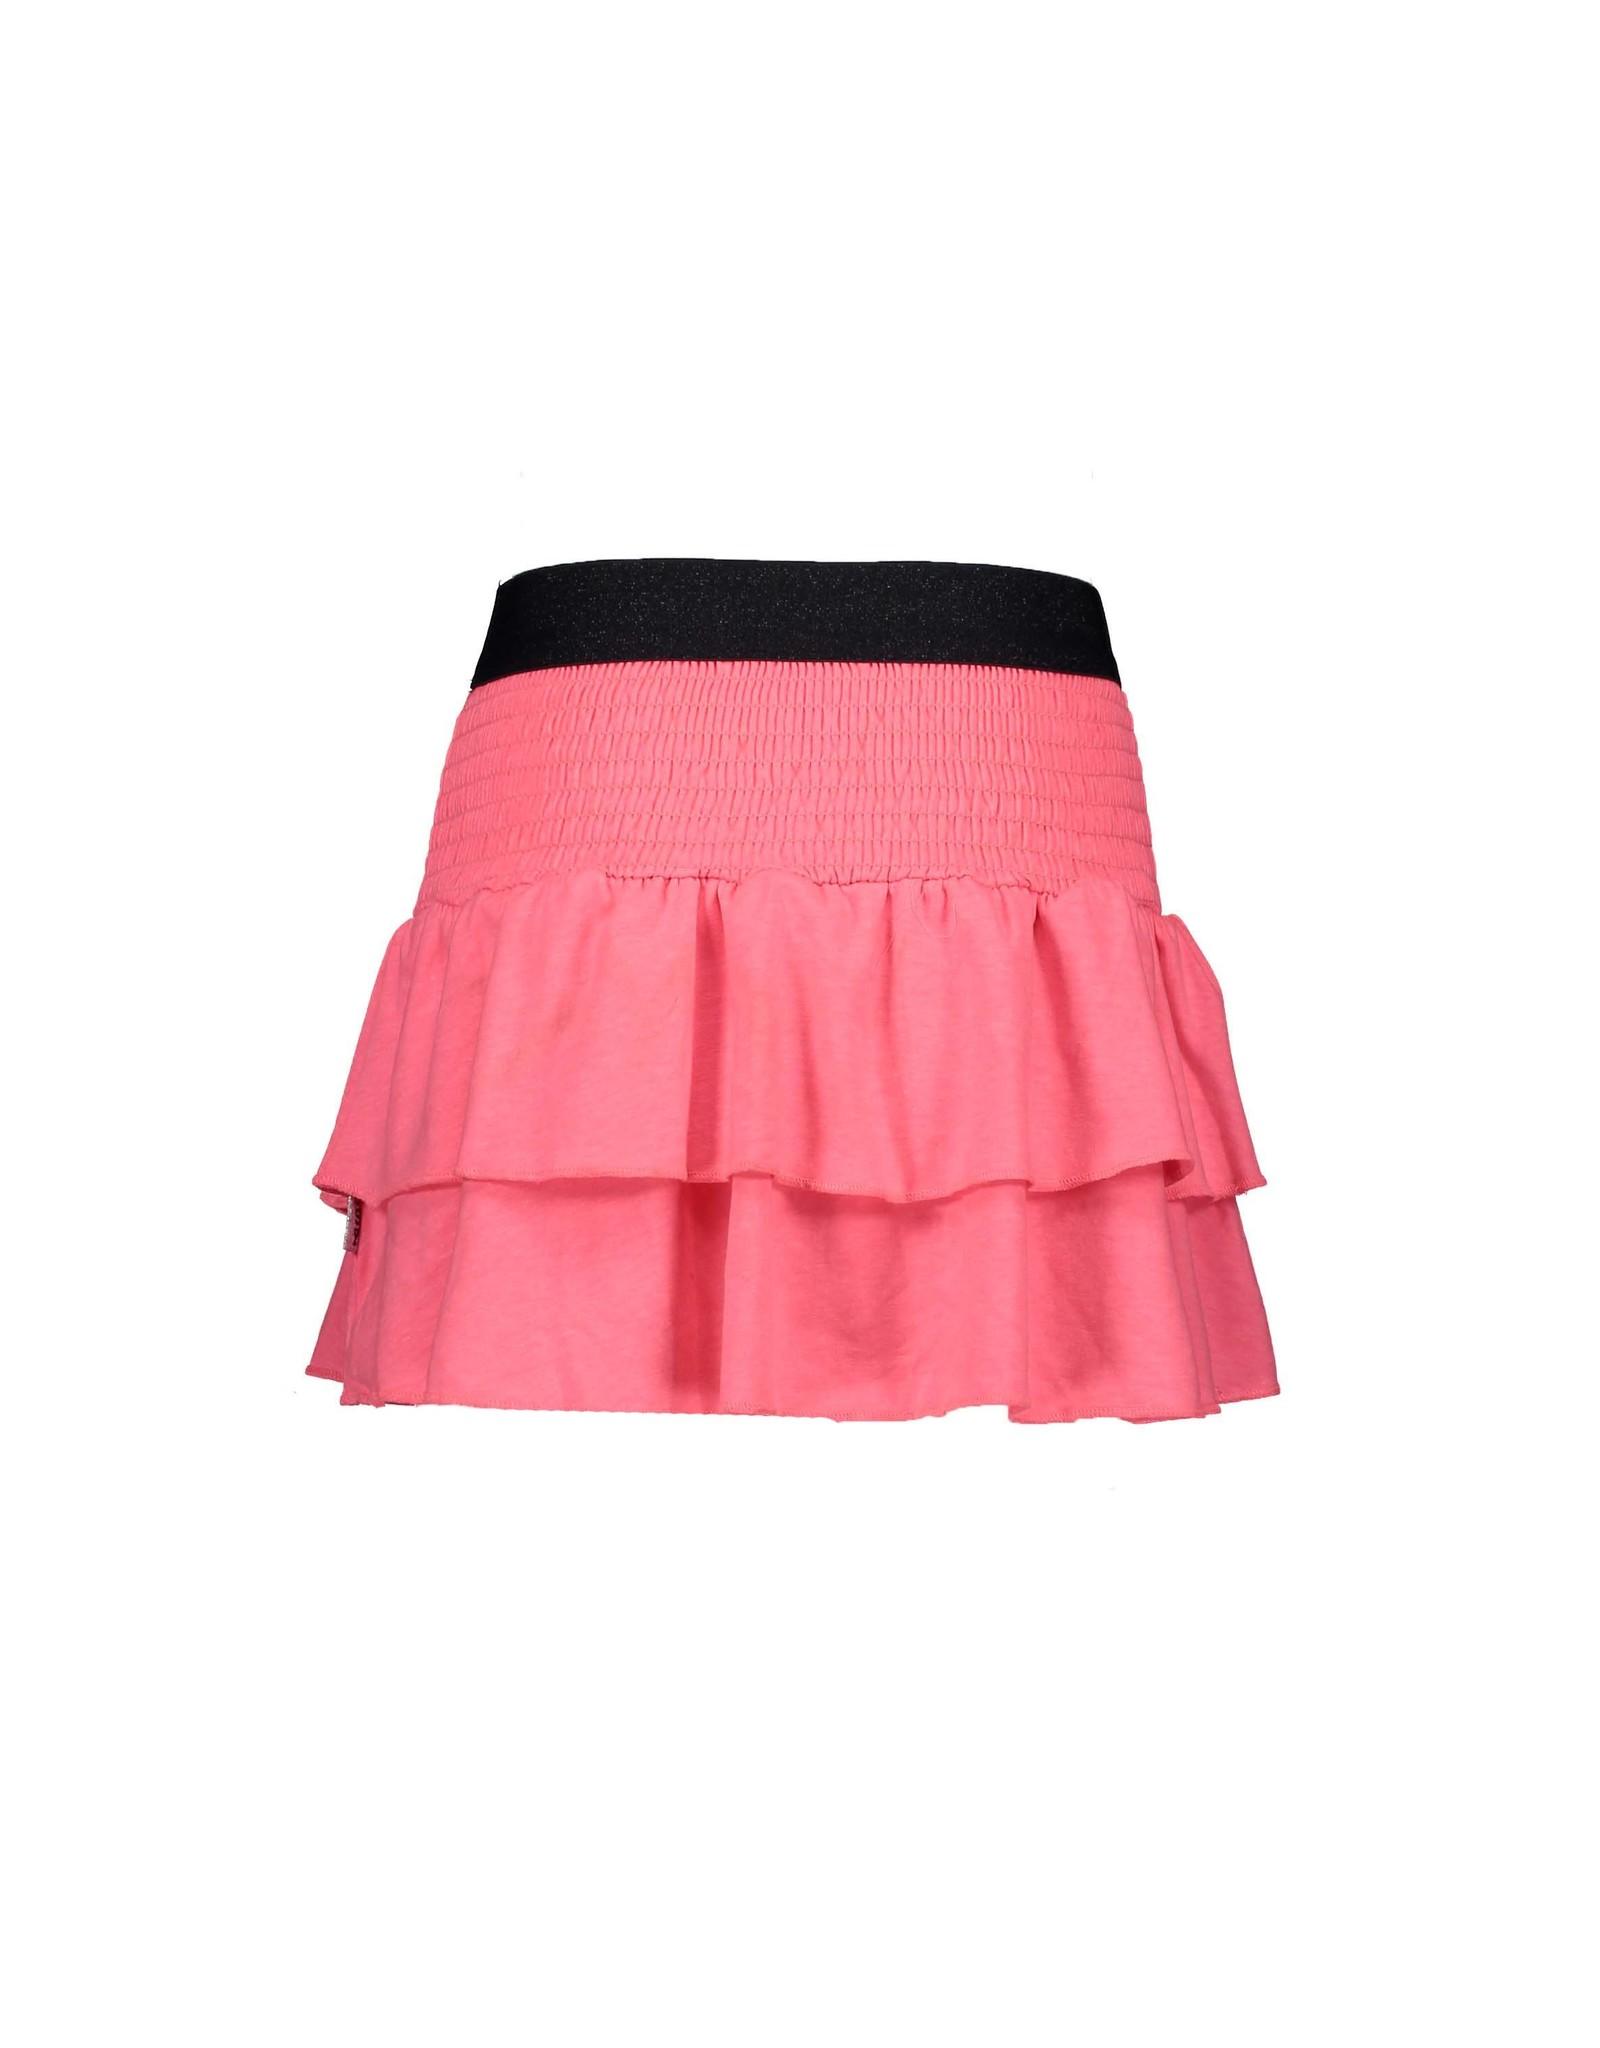 B.Nosy B.Nosy Girls Beach Skirt with layers FESTIVAL PINK